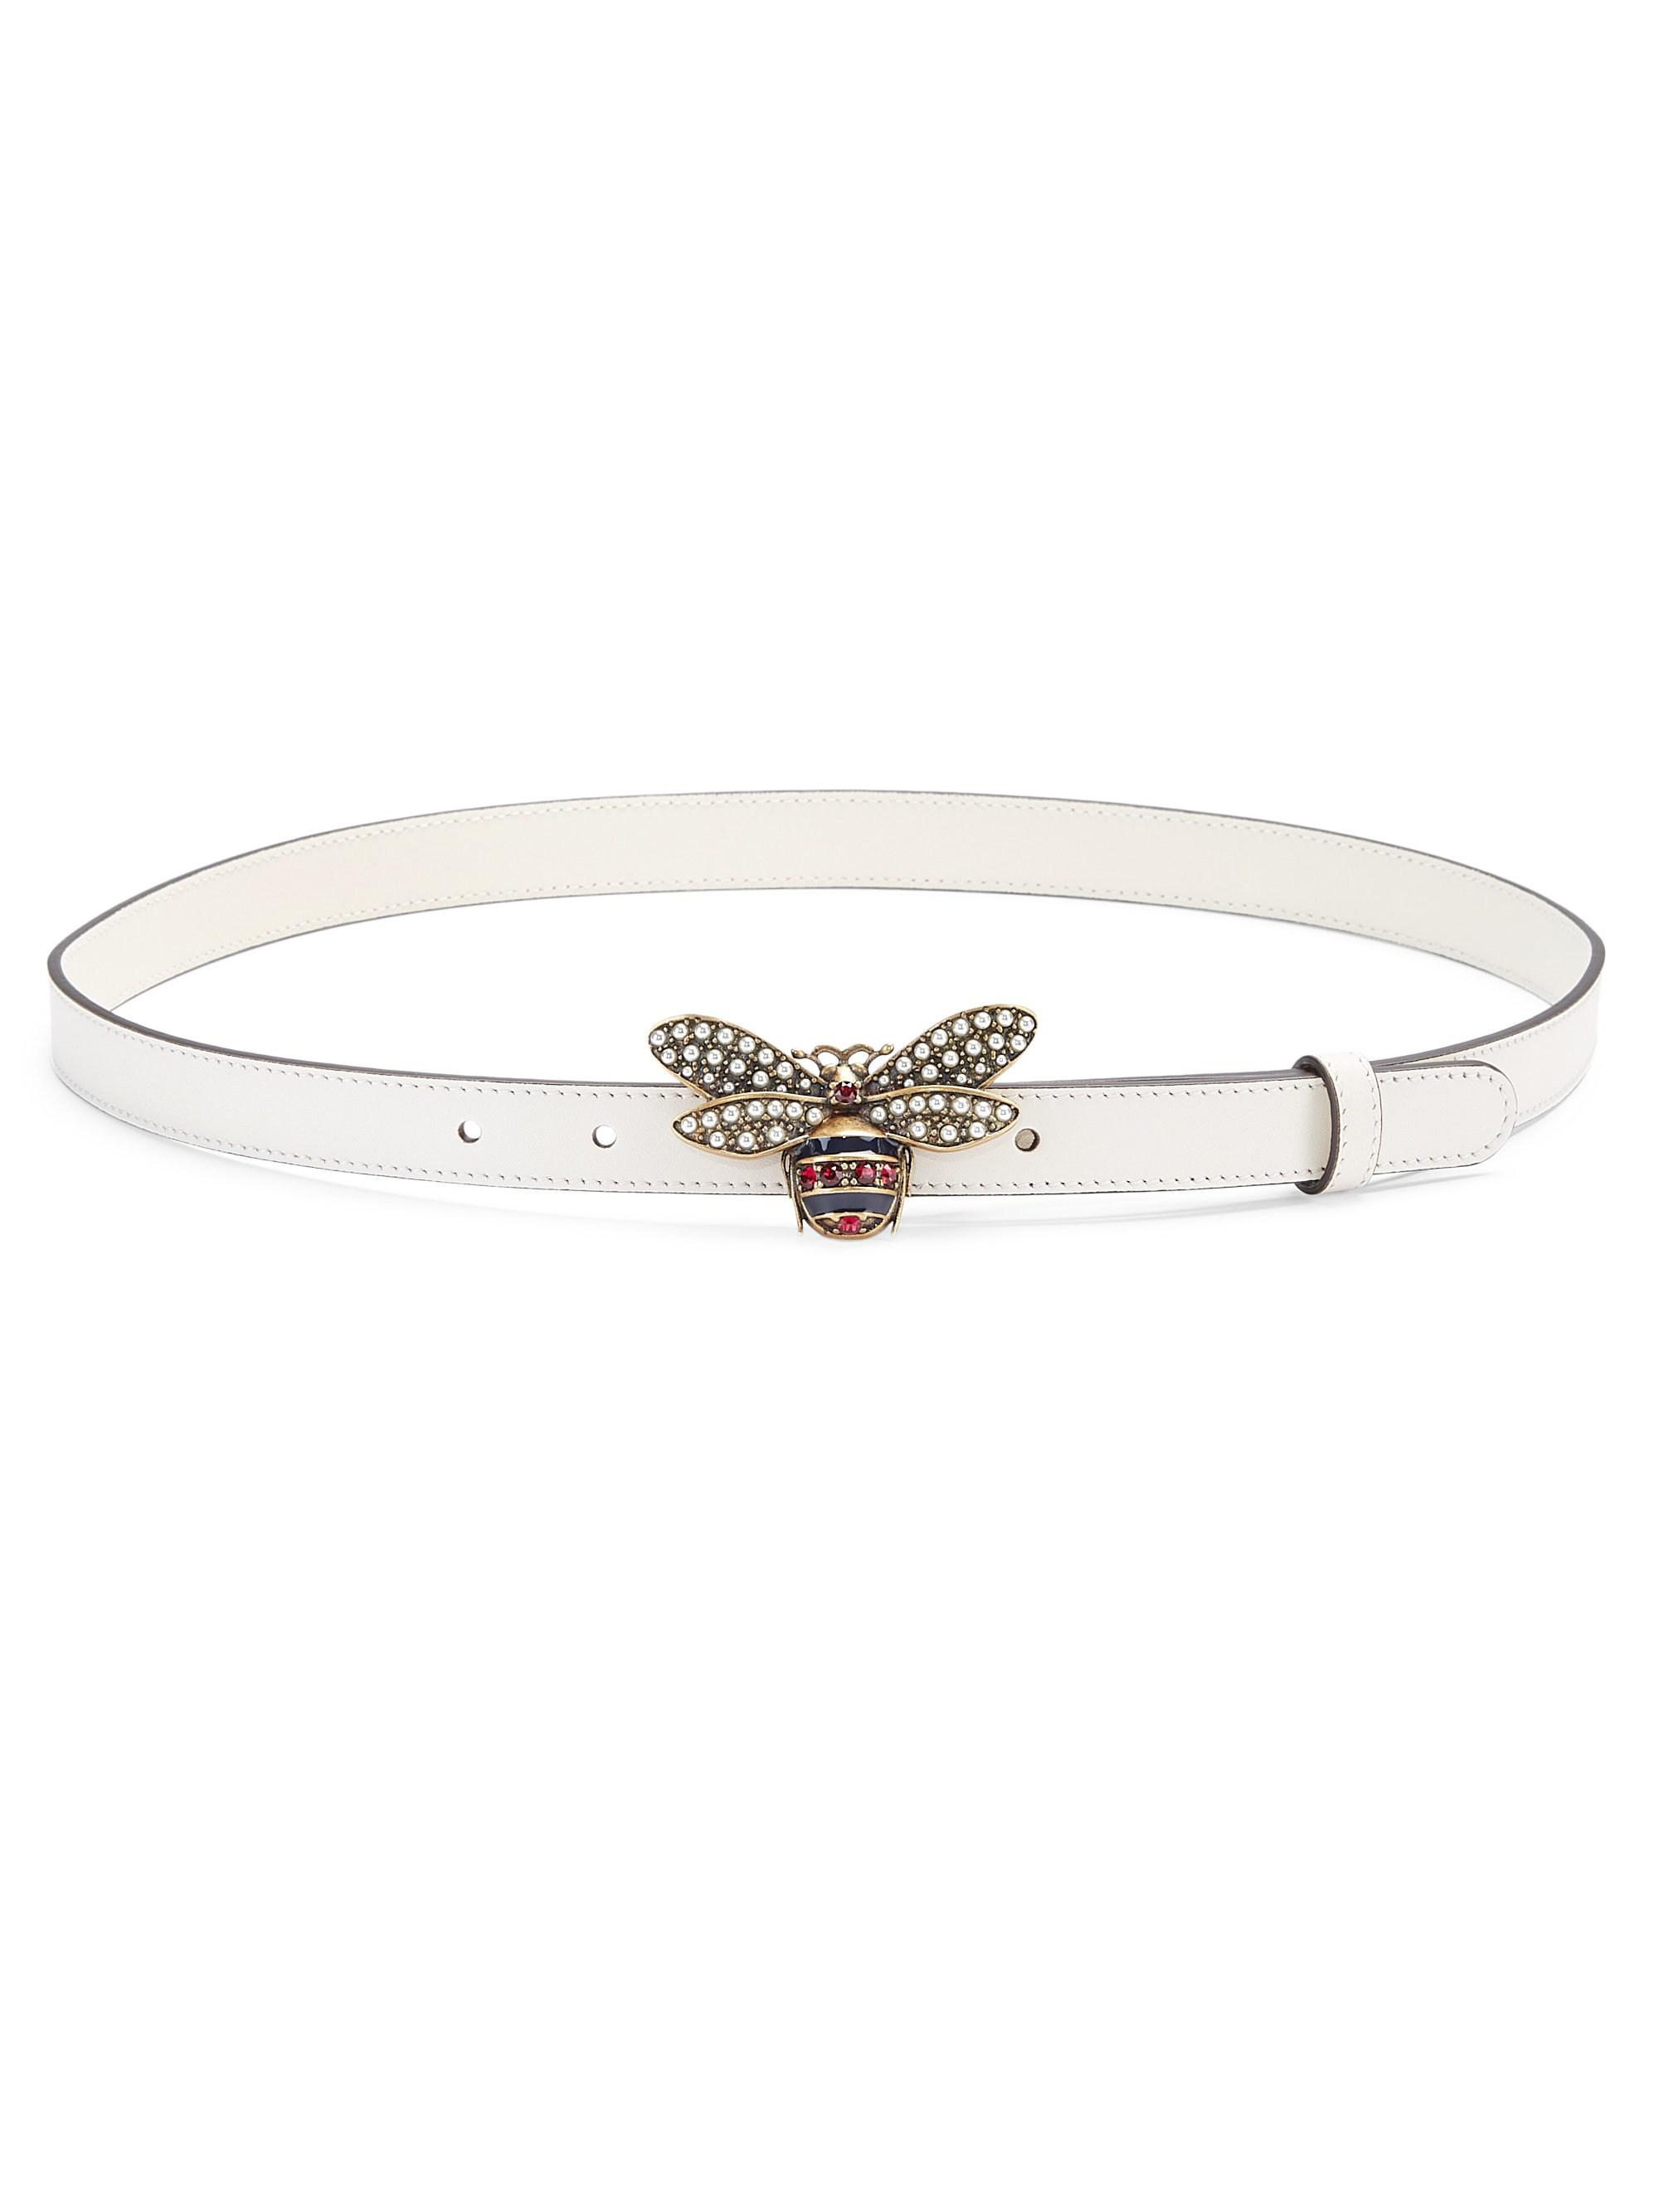 51036193605 Lyst - Gucci Queen Margaret Leather Belt in White